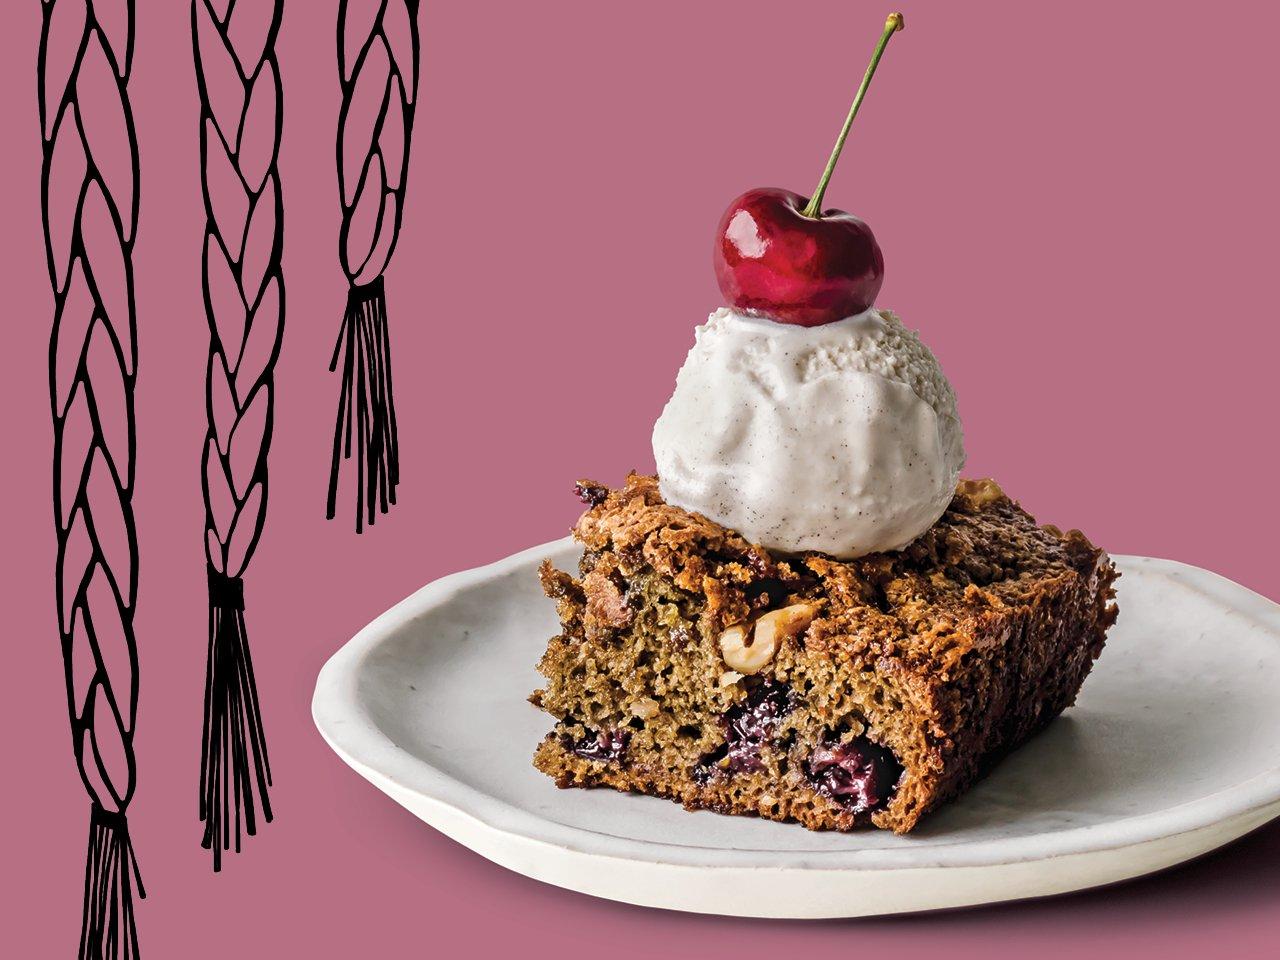 Sweetgrass Cherry Cake